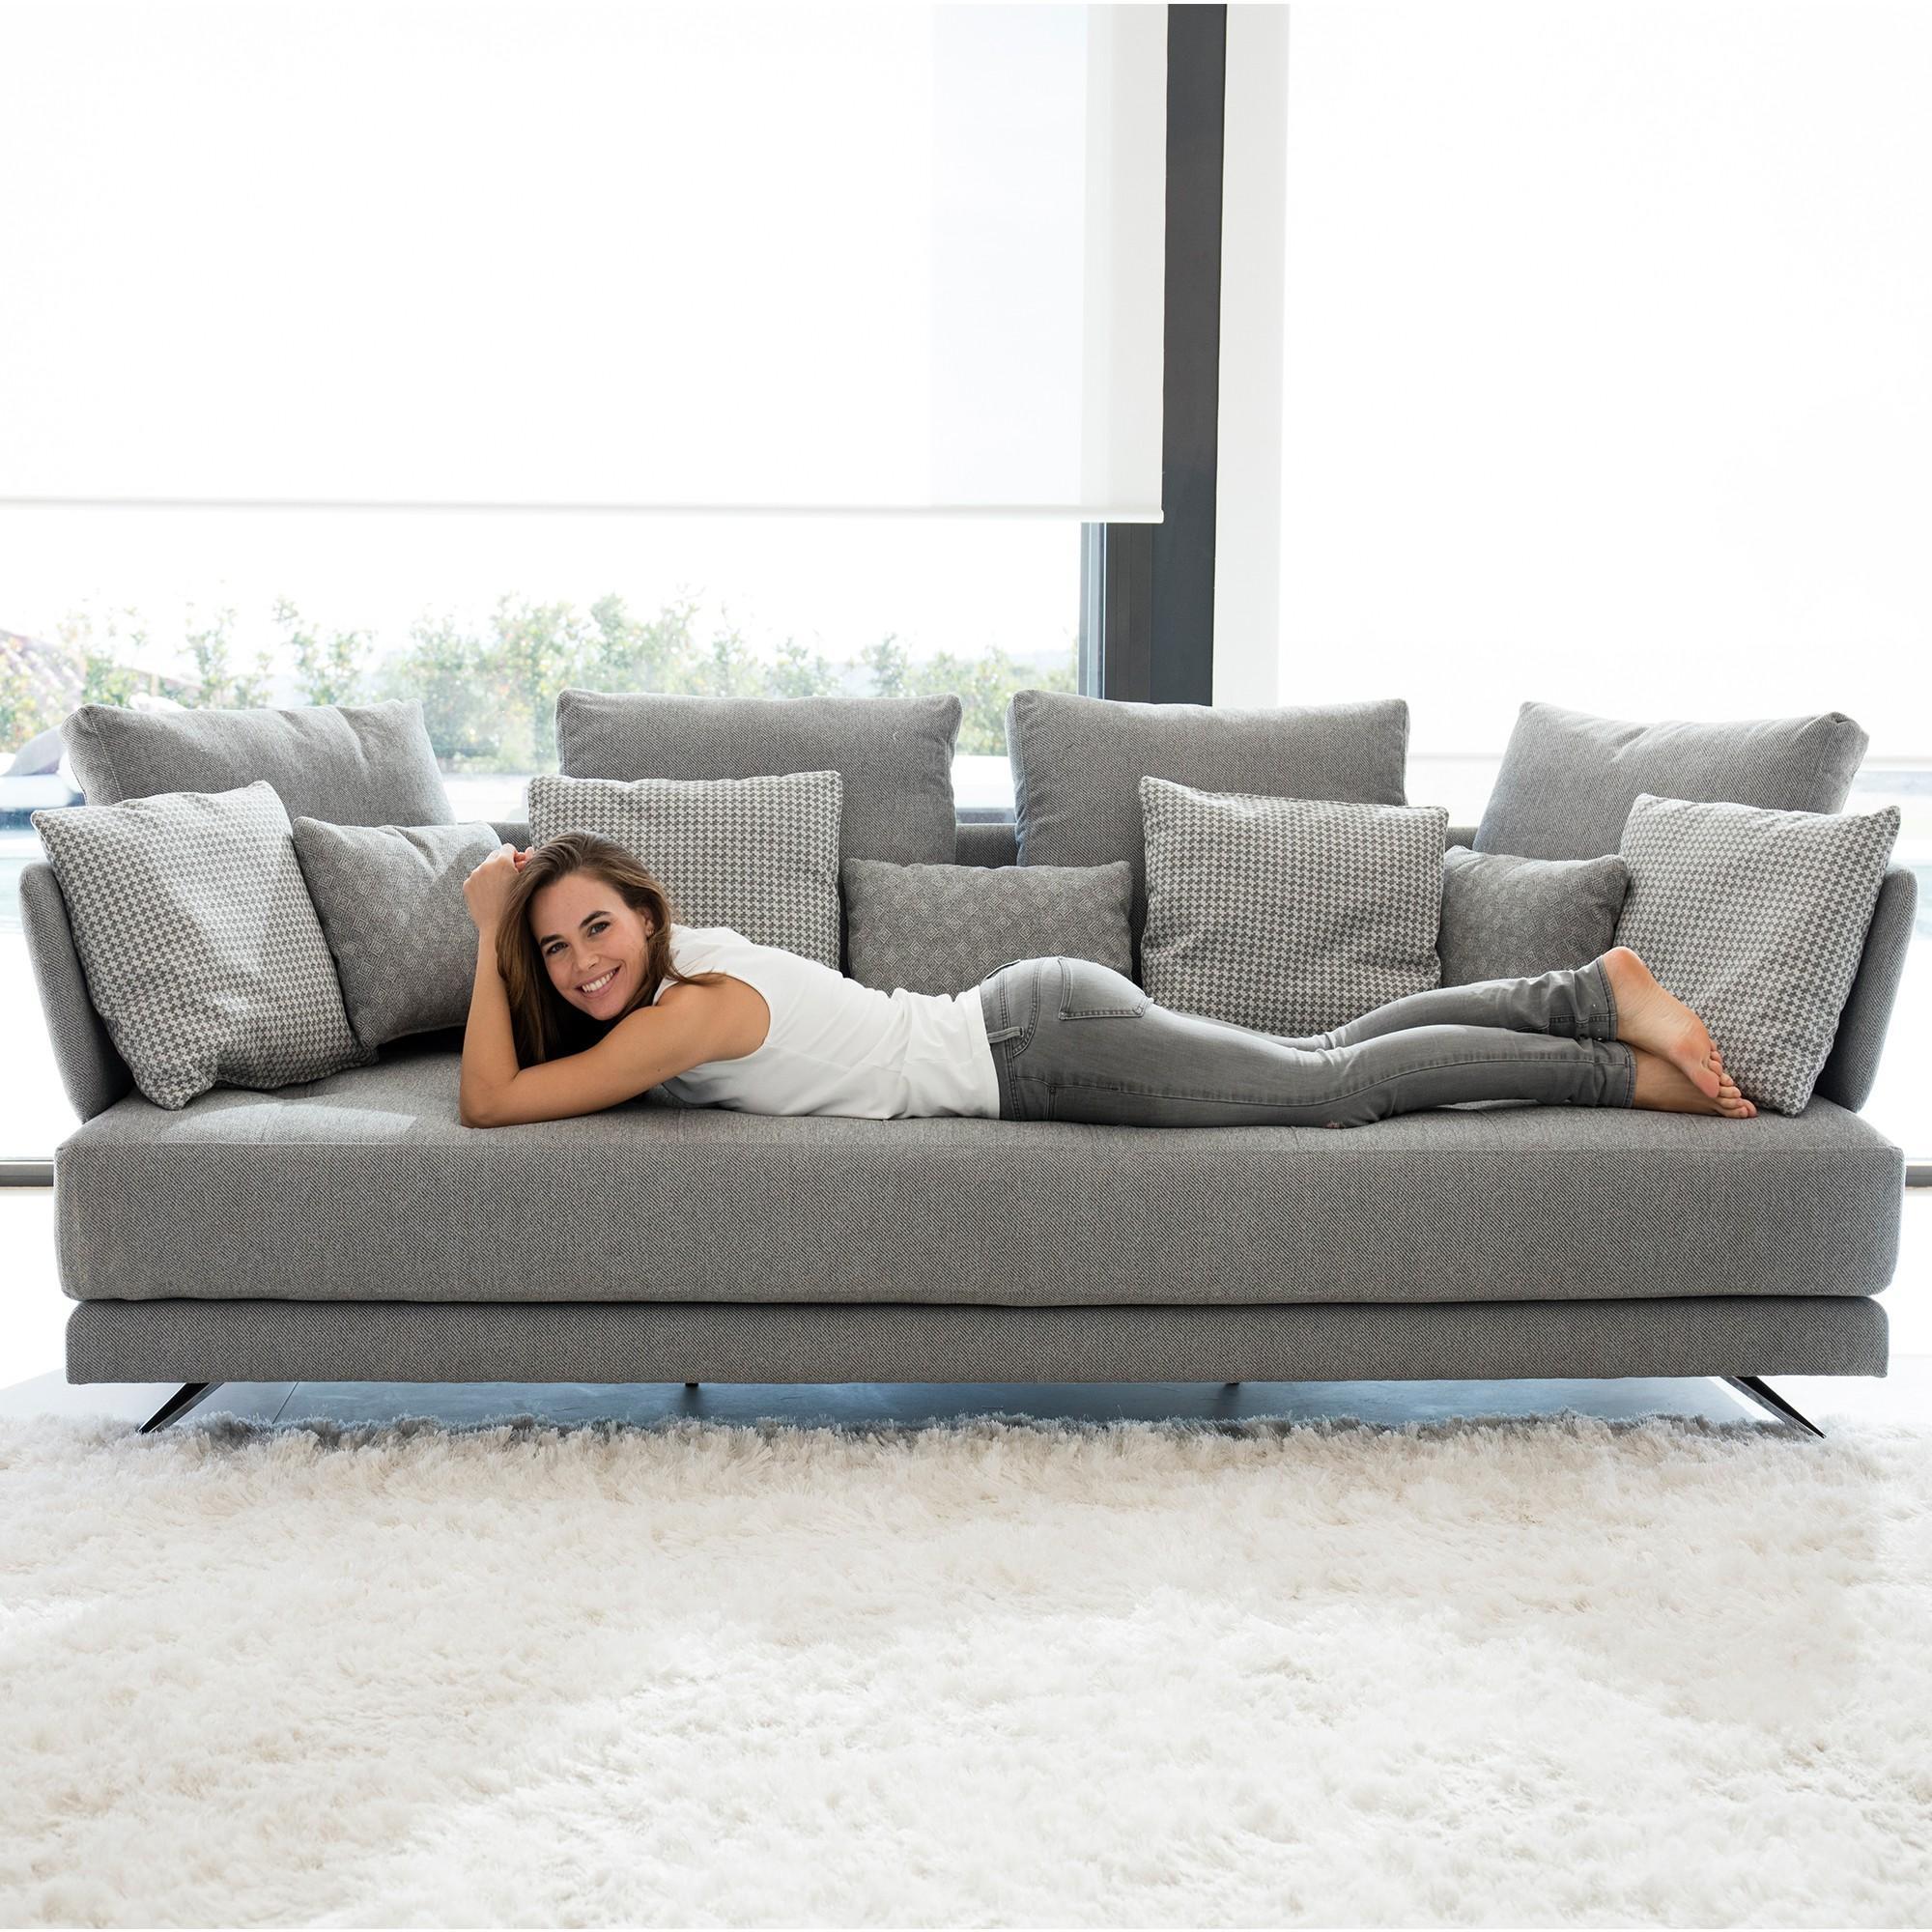 Fama Pacific 4 Seater Sofa – Fabric Sofas – Cookes Furniture Regarding Large 4 Seater Sofas (Image 4 of 20)